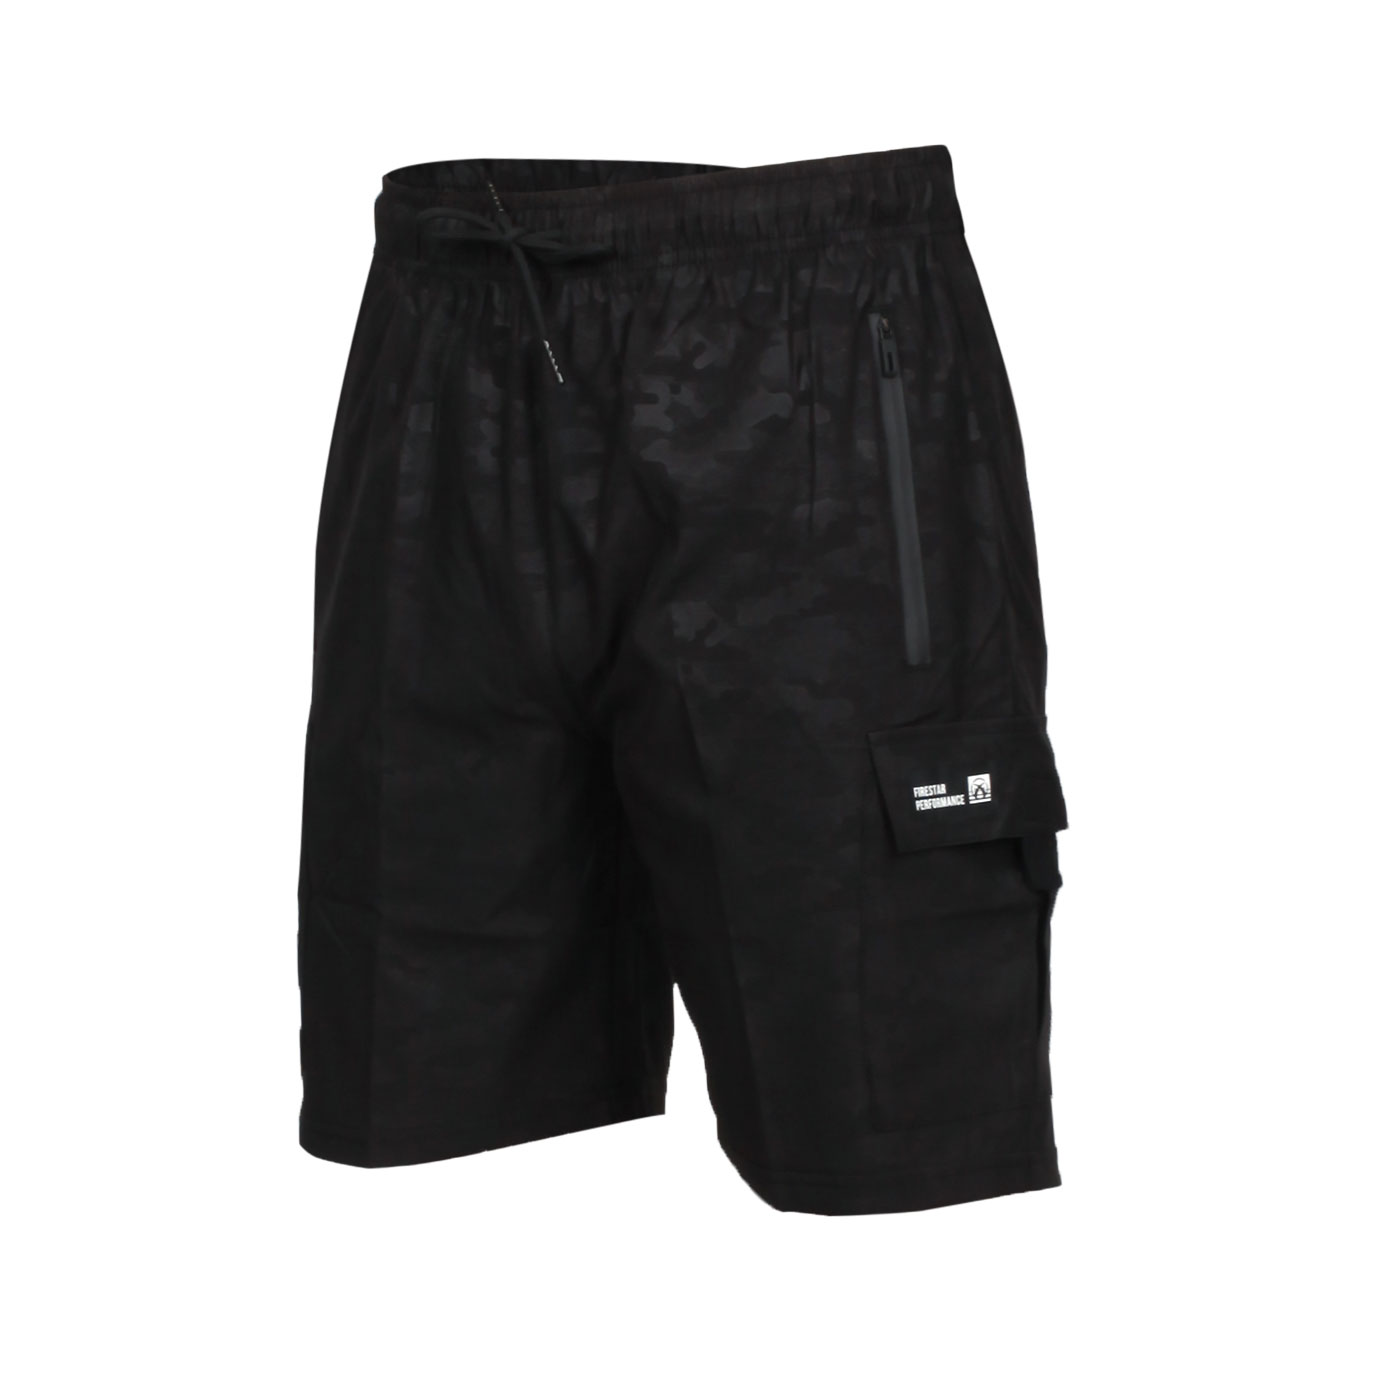 FIRESTAR 男款彈性多口袋短褲 C0519-10